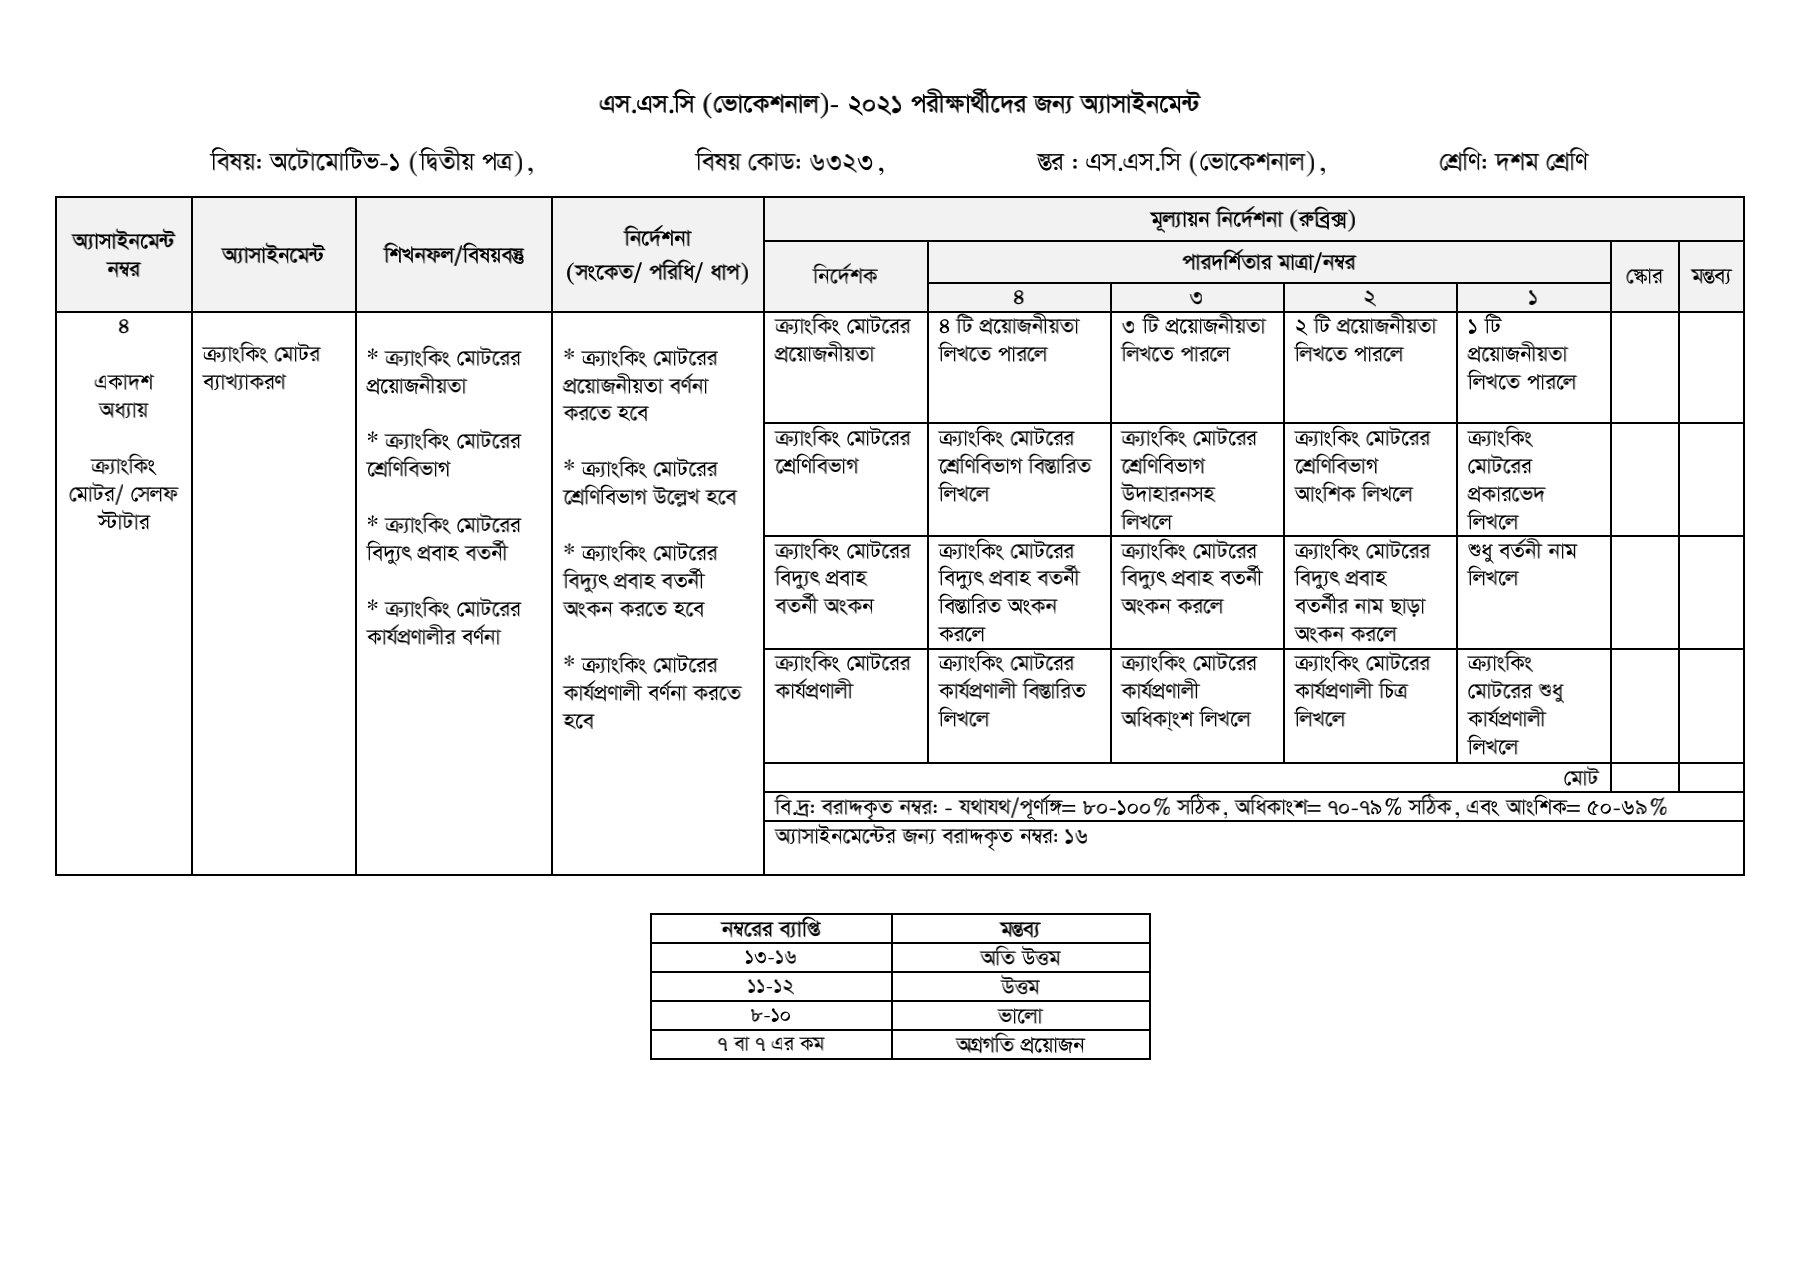 SSC / Dakhil (Vocational) 9th-10th class assignment solution / Answer 2021 3rd week 11